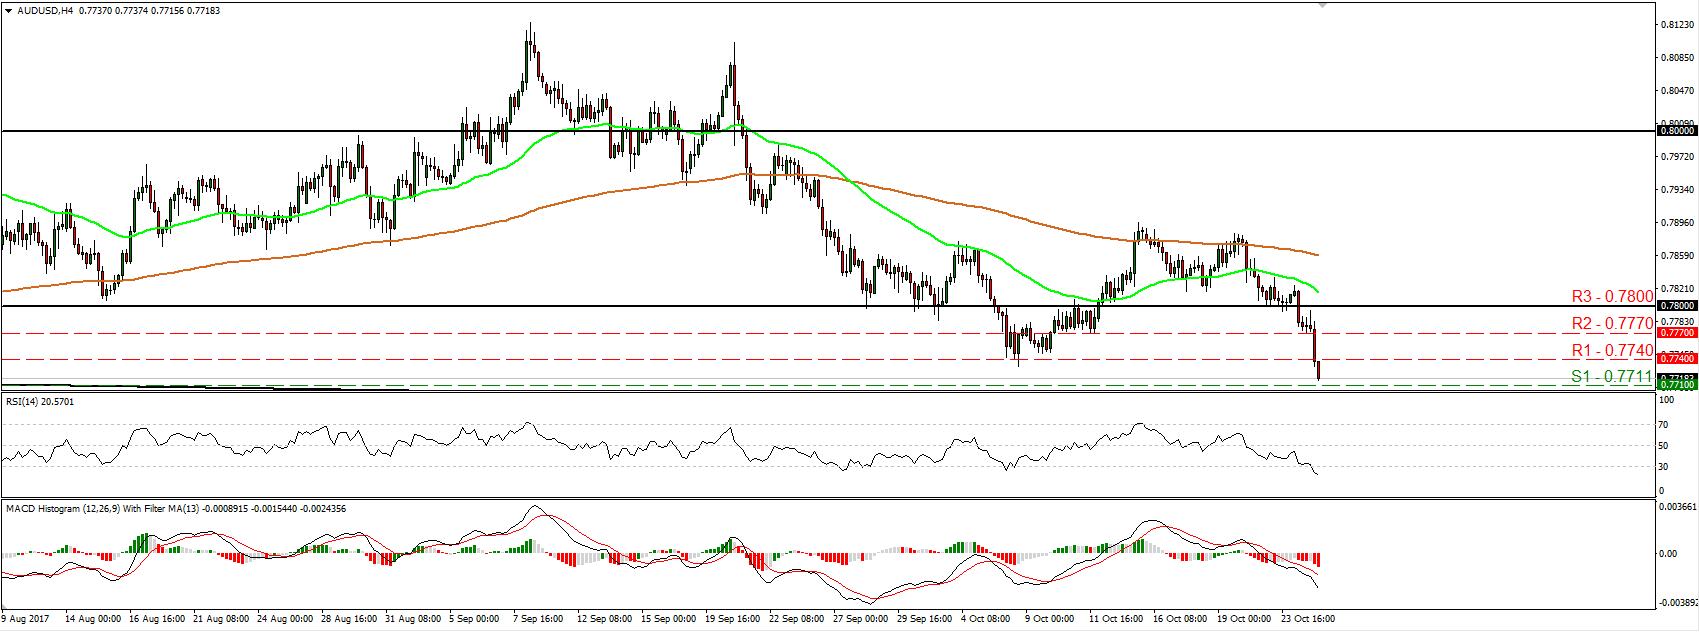 AUD/USD 25 Oct 2017 | Econ Alerts